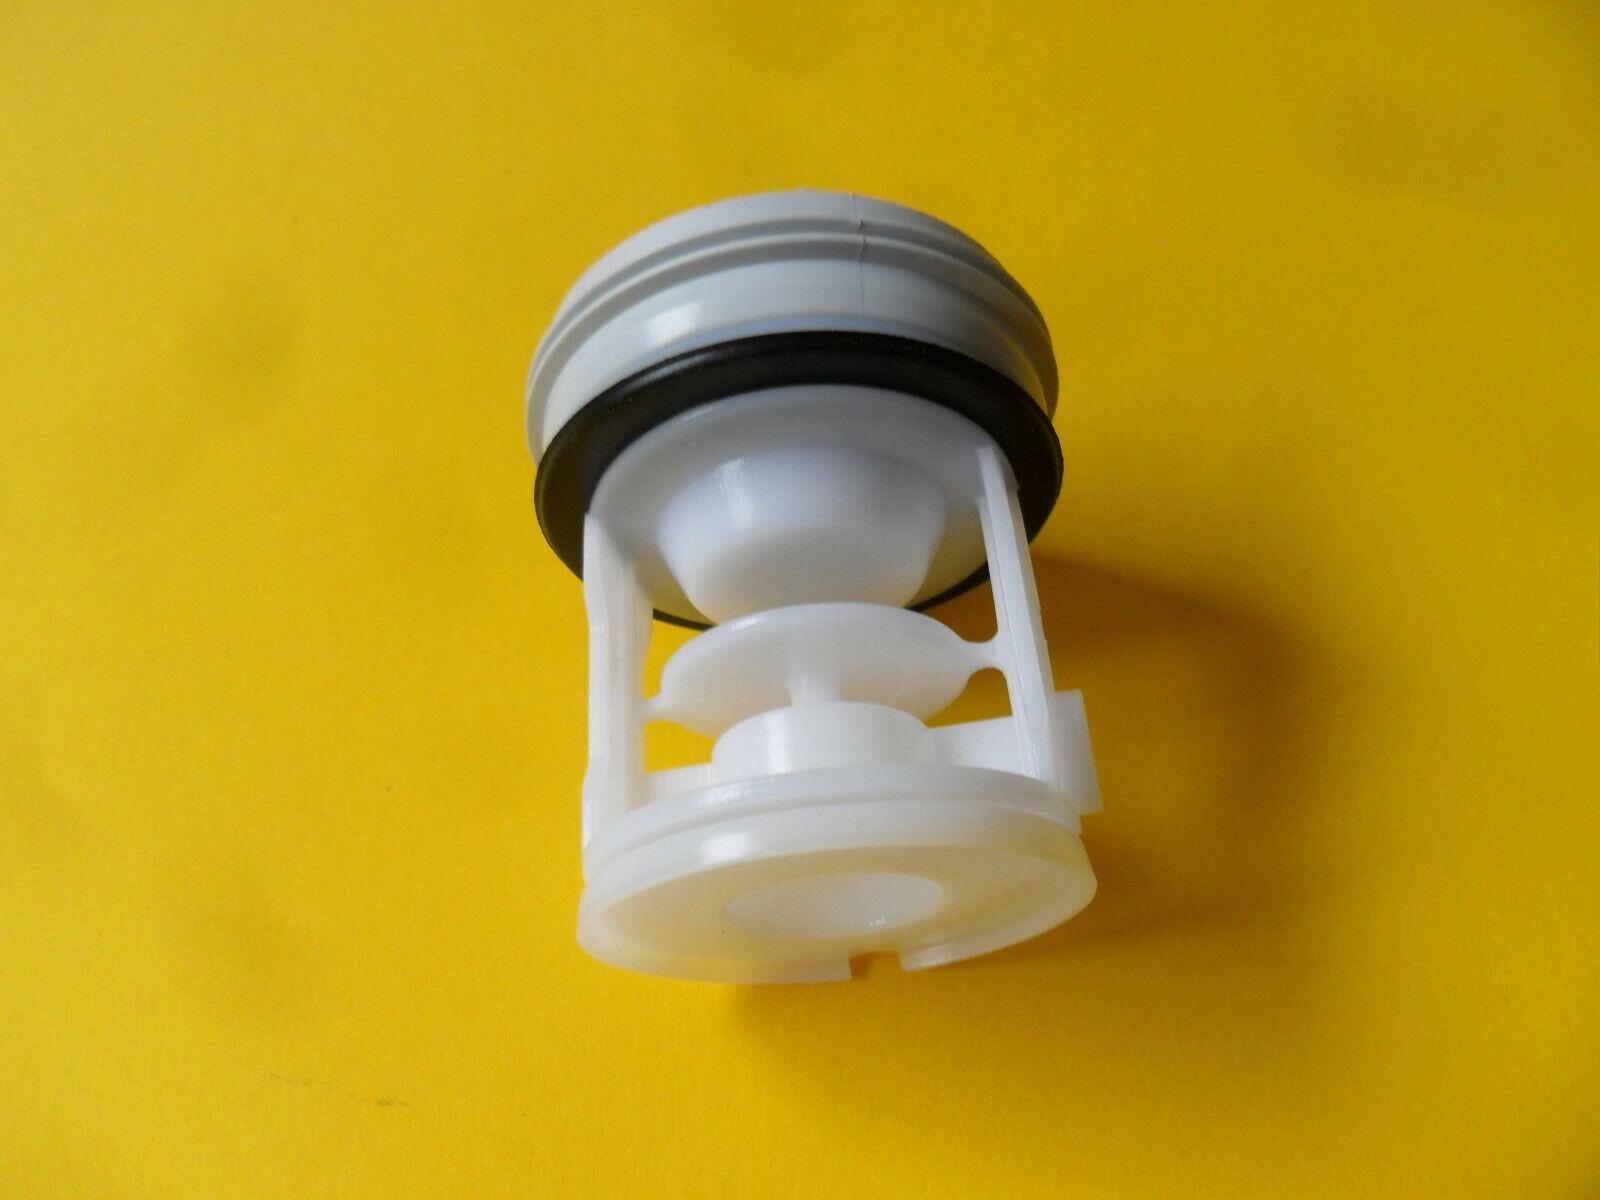 Trommellager komplett  Waschmaschine Haier OK  0020300341